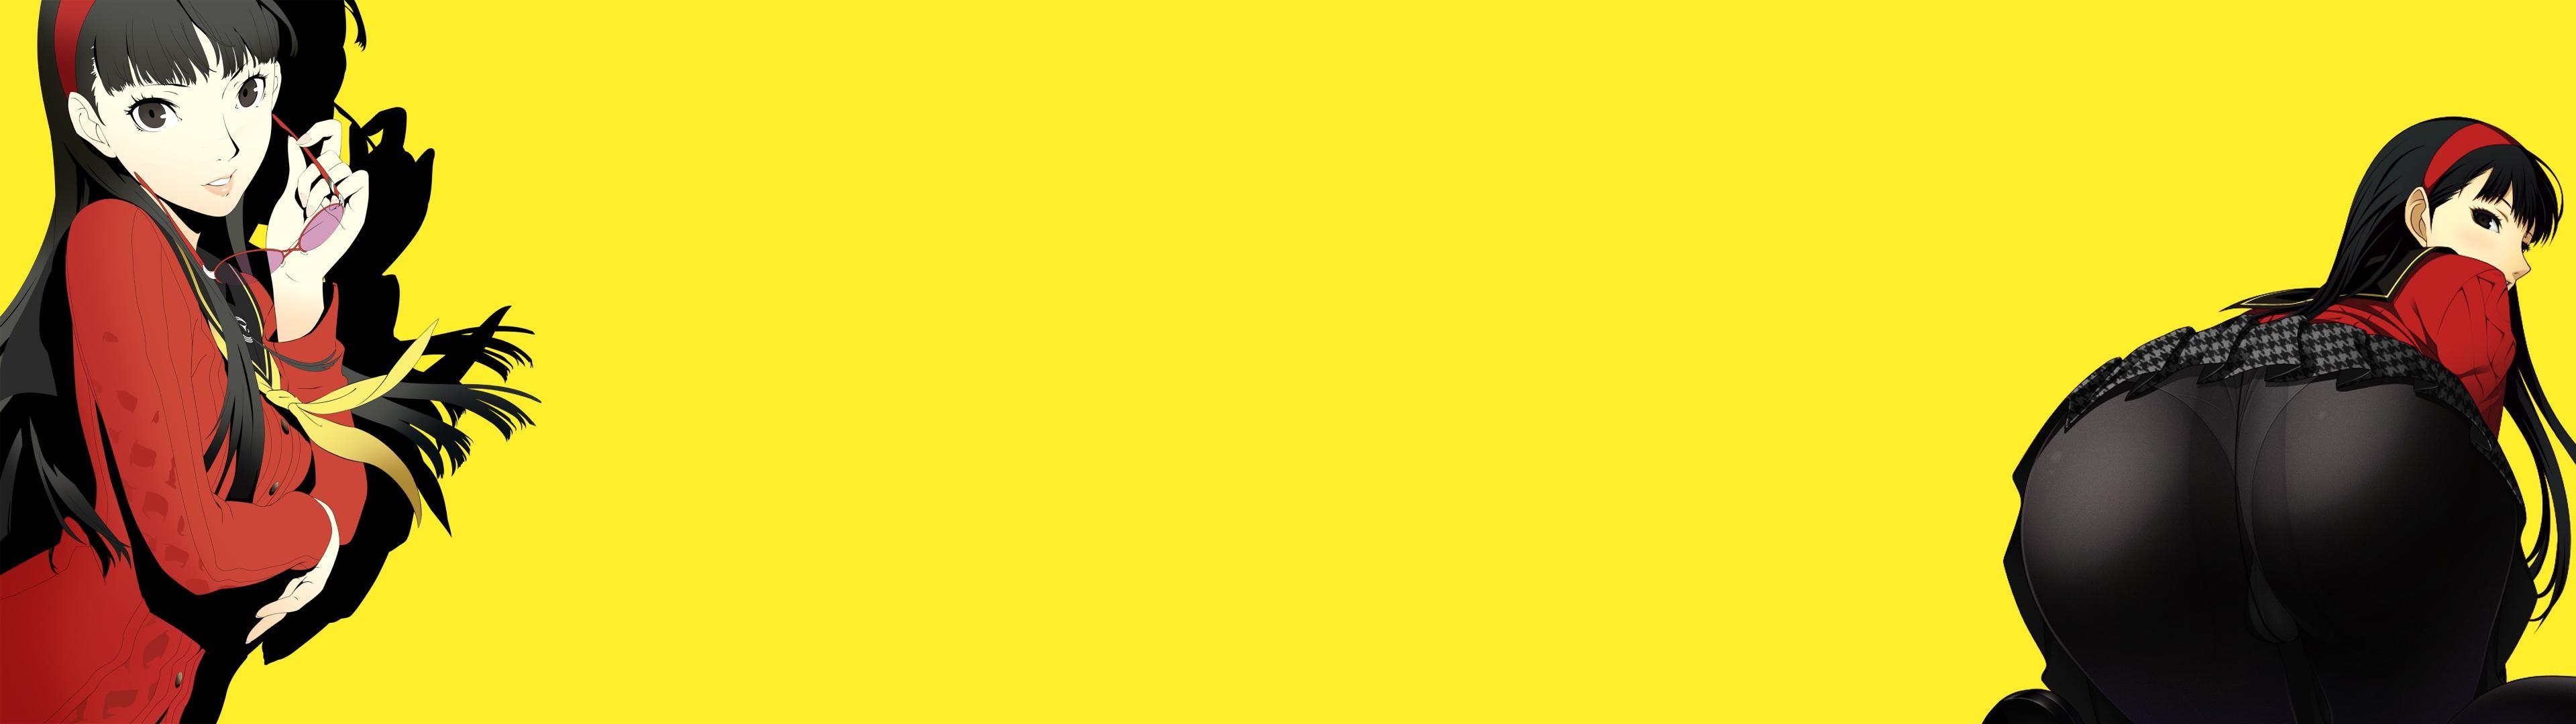 Self Made(half-OC) Yukiko Amagi (Persona 4) [3840×1080] …